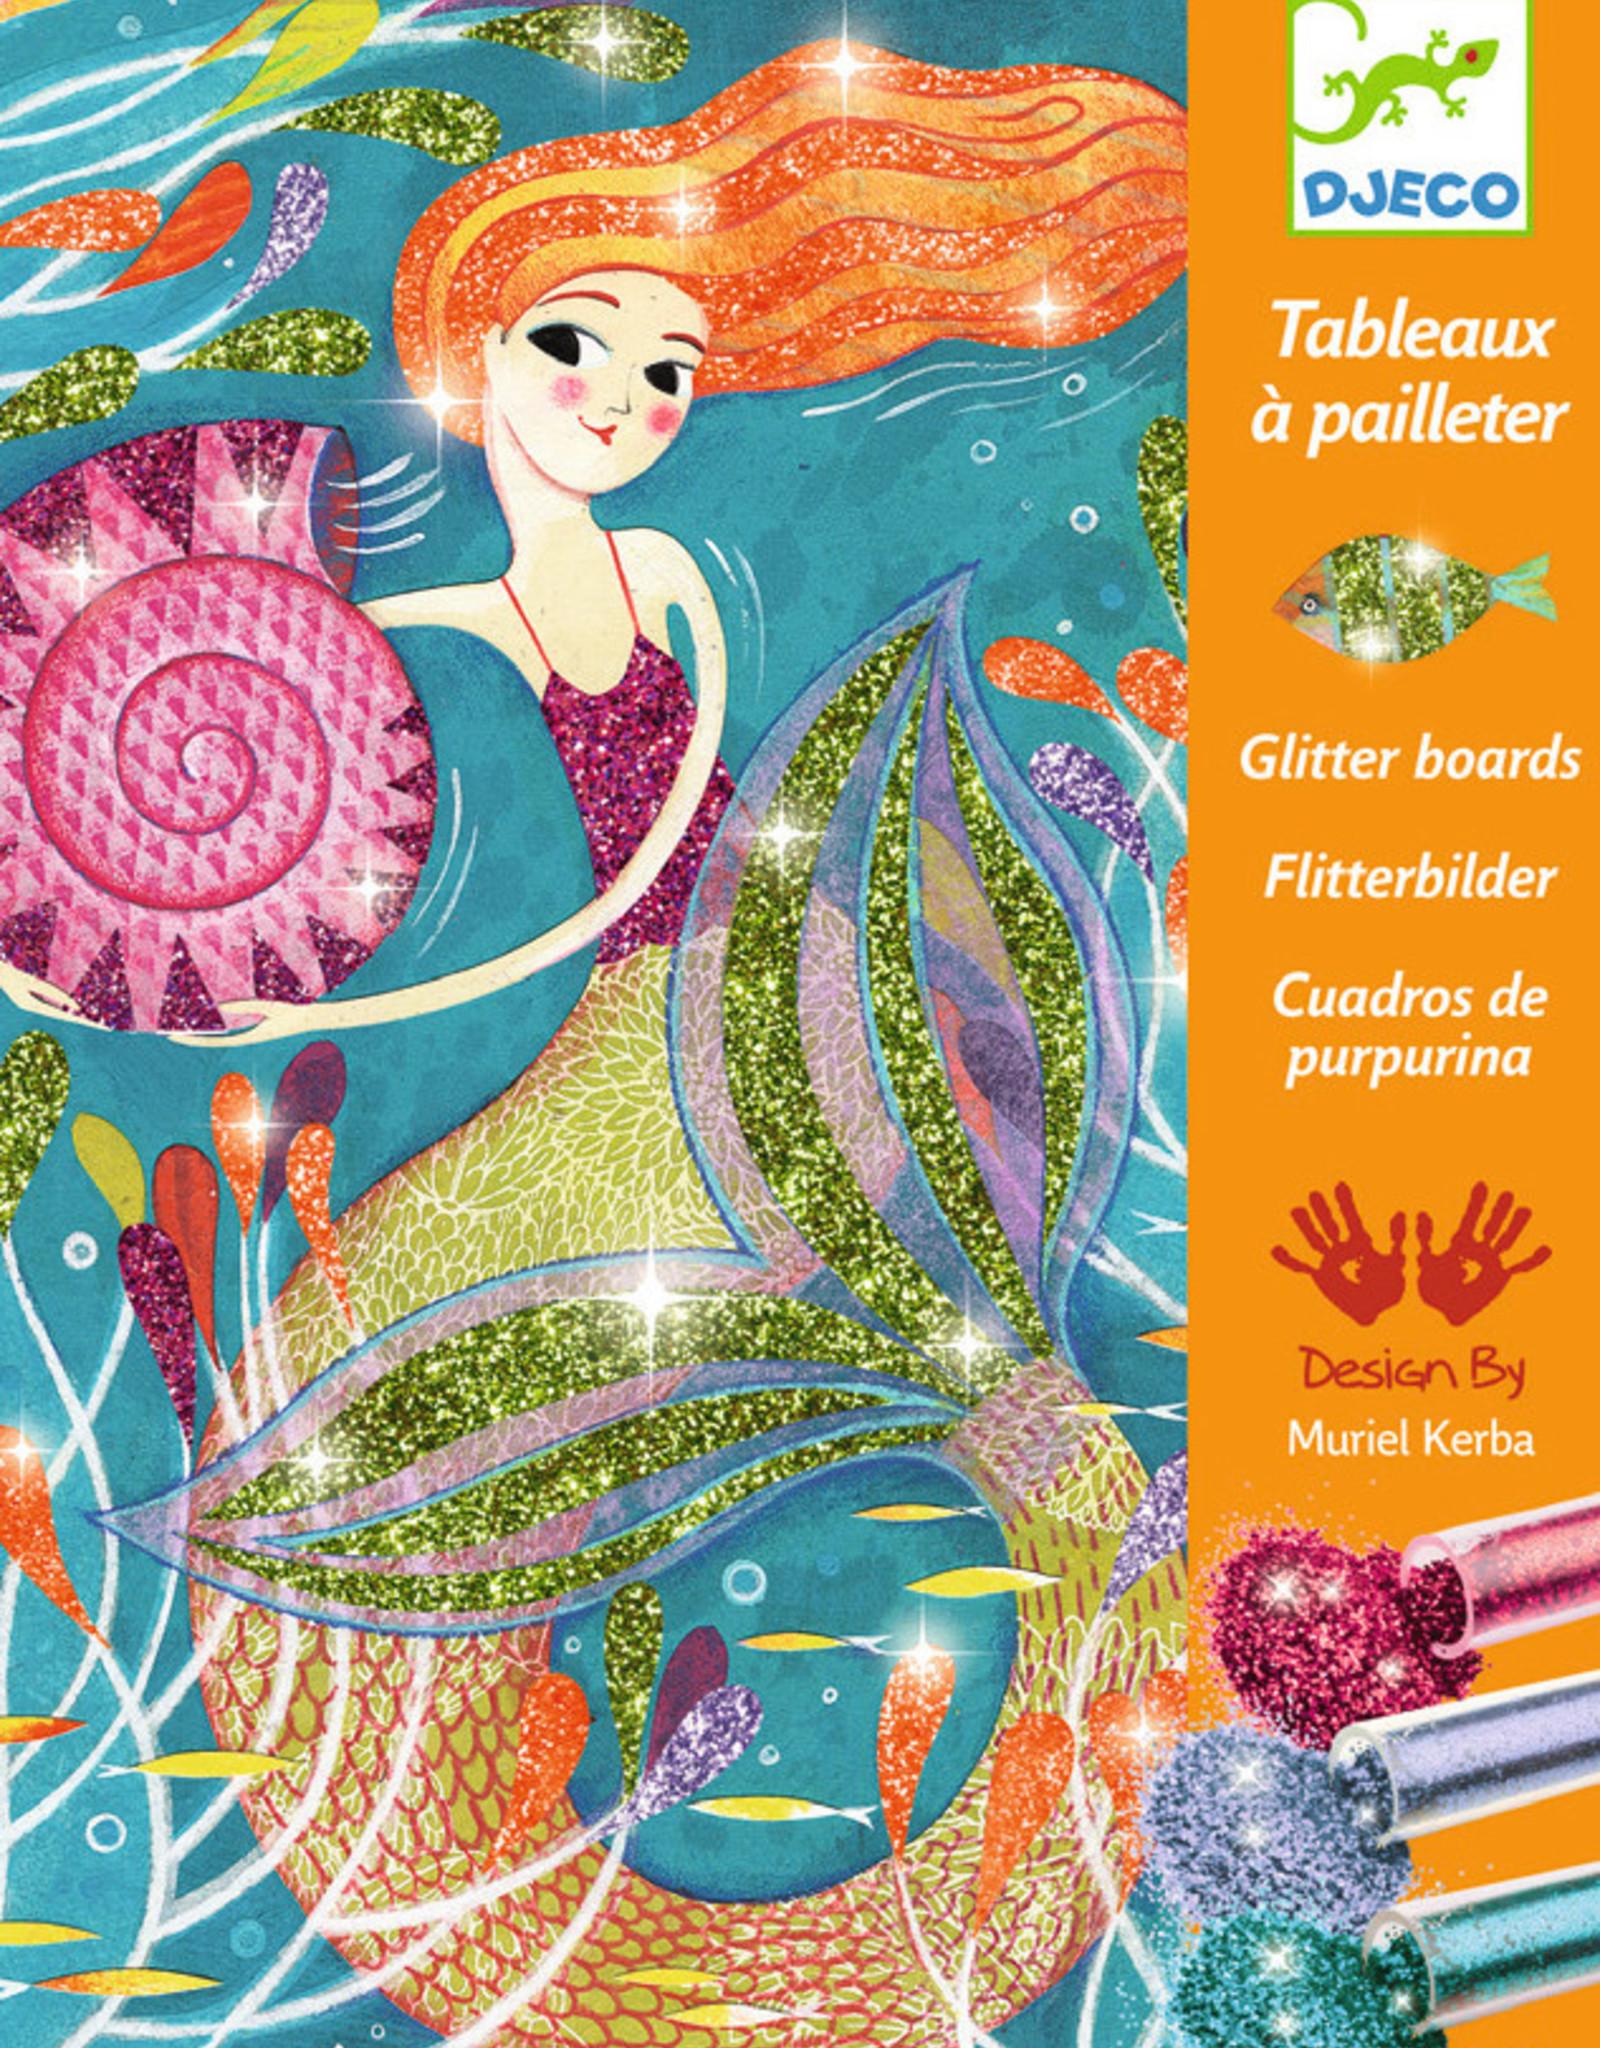 Djeco Glitter Boards, Mermaids, Set of 4 Boards